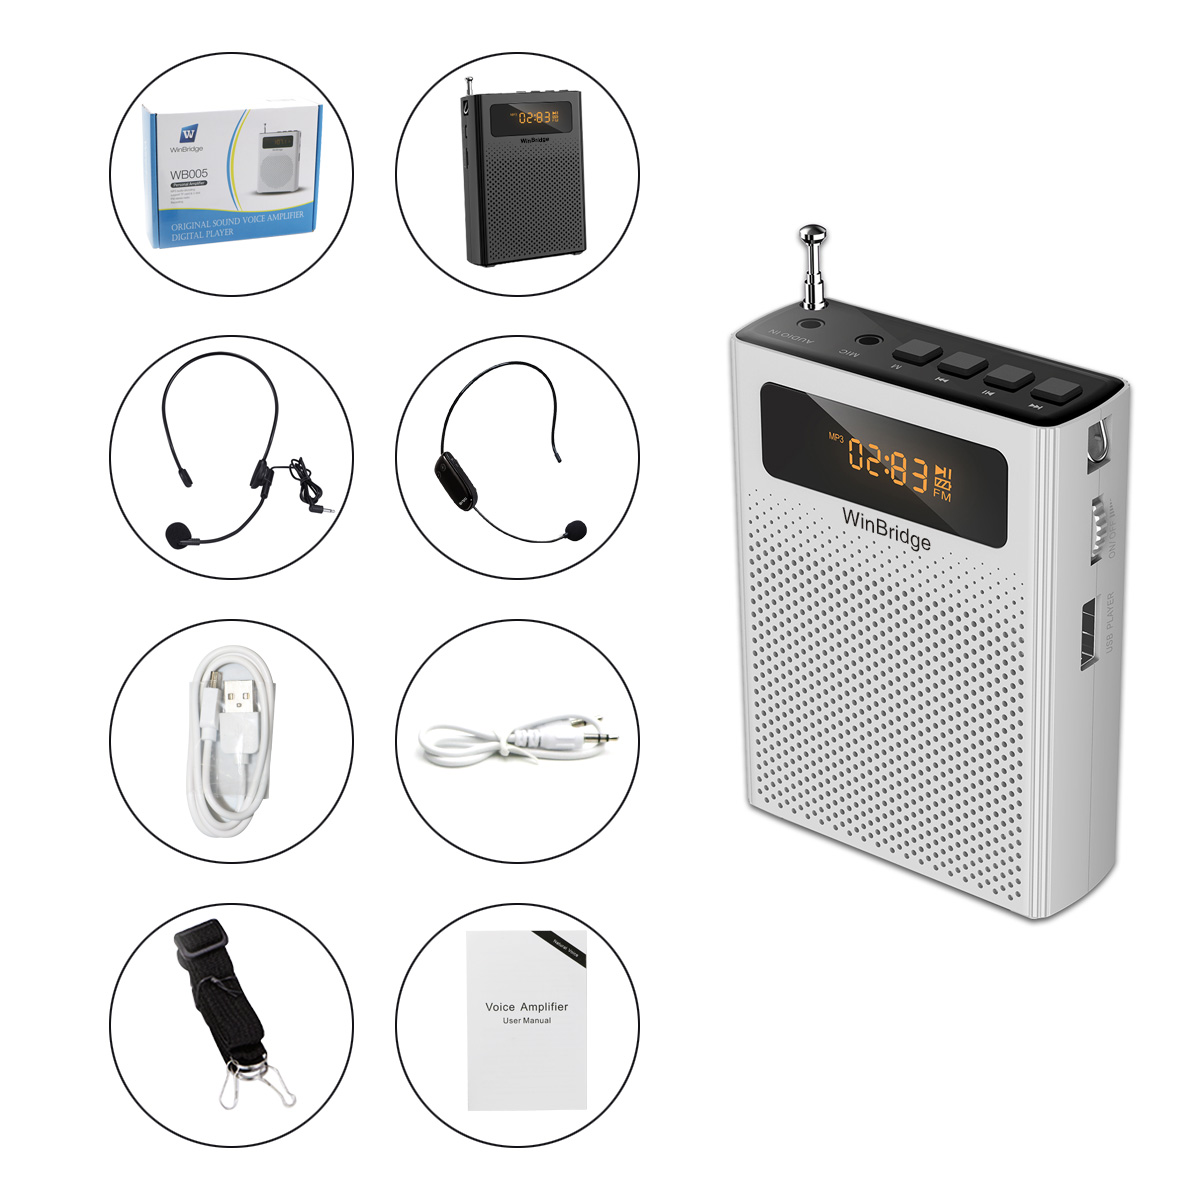 Winbridge winbridge voice amplifier factory for sale-15